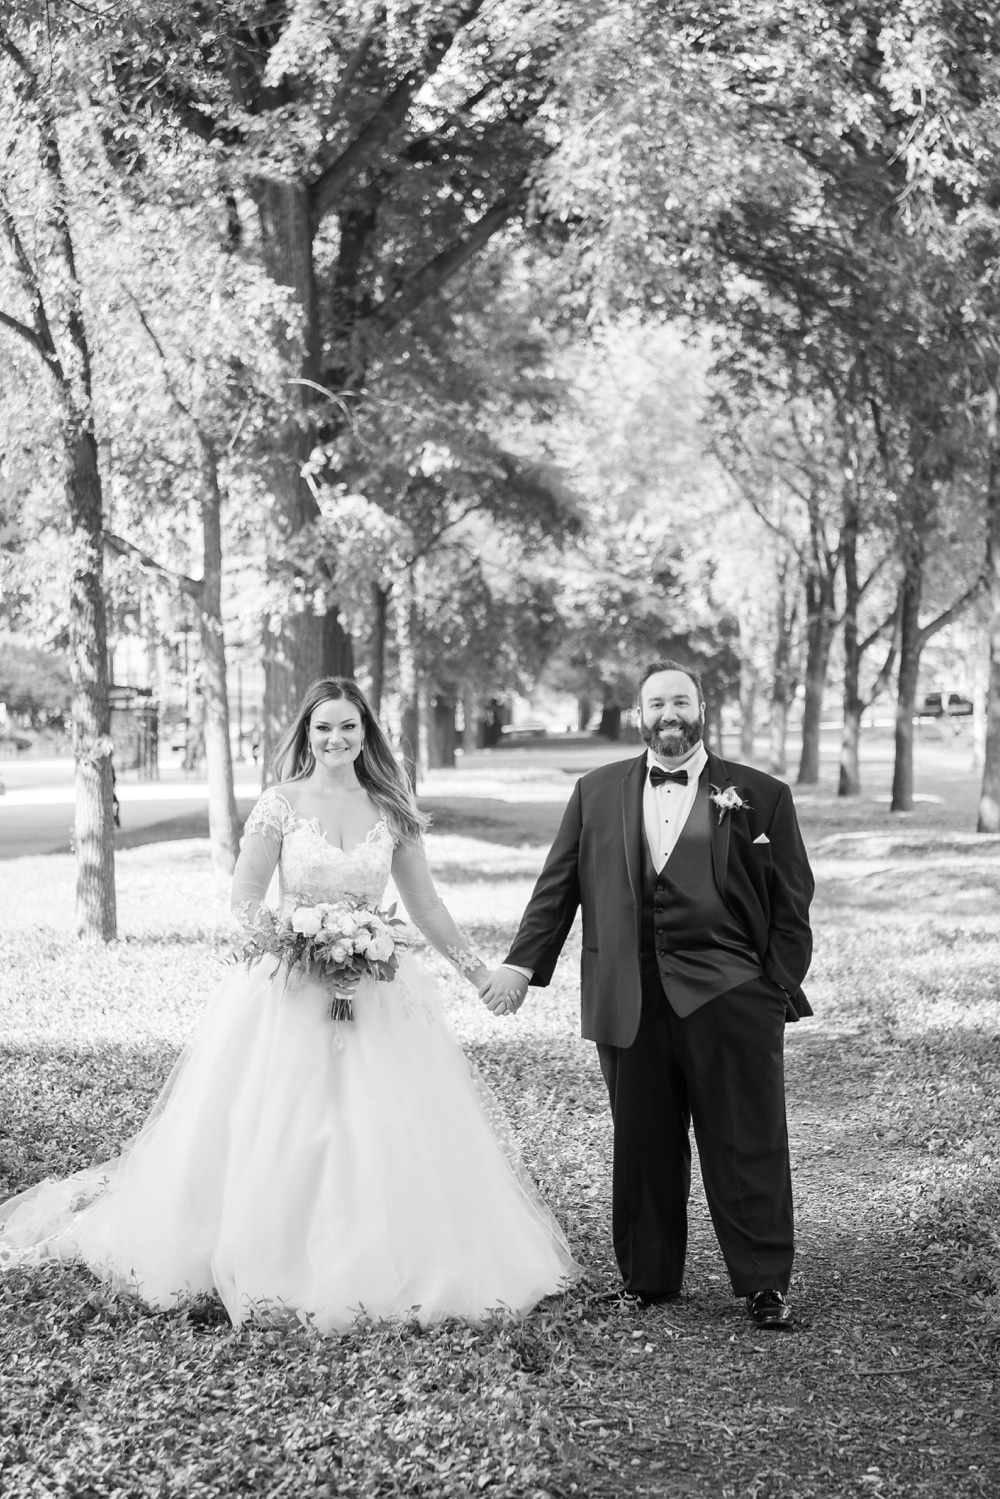 Kristin-La-Voie-Photography-field-museum-chicago-wedding-photos-292